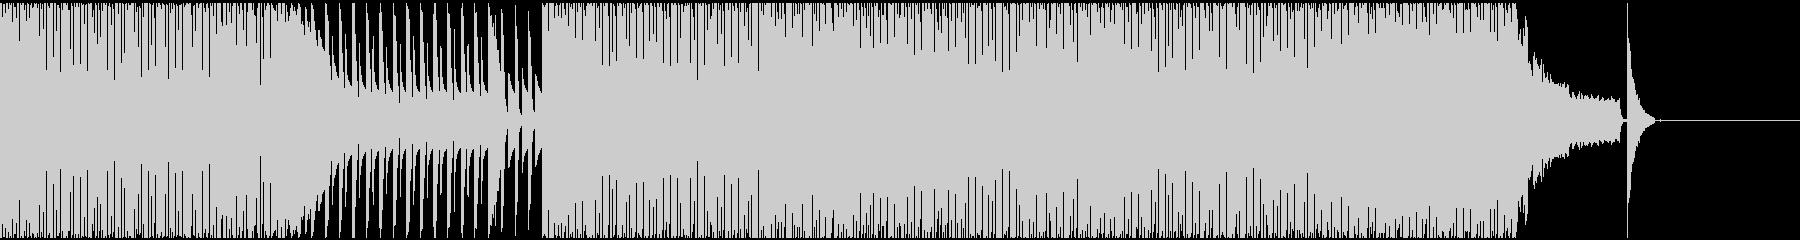 【EDM】クラブダンスミュージック2の未再生の波形